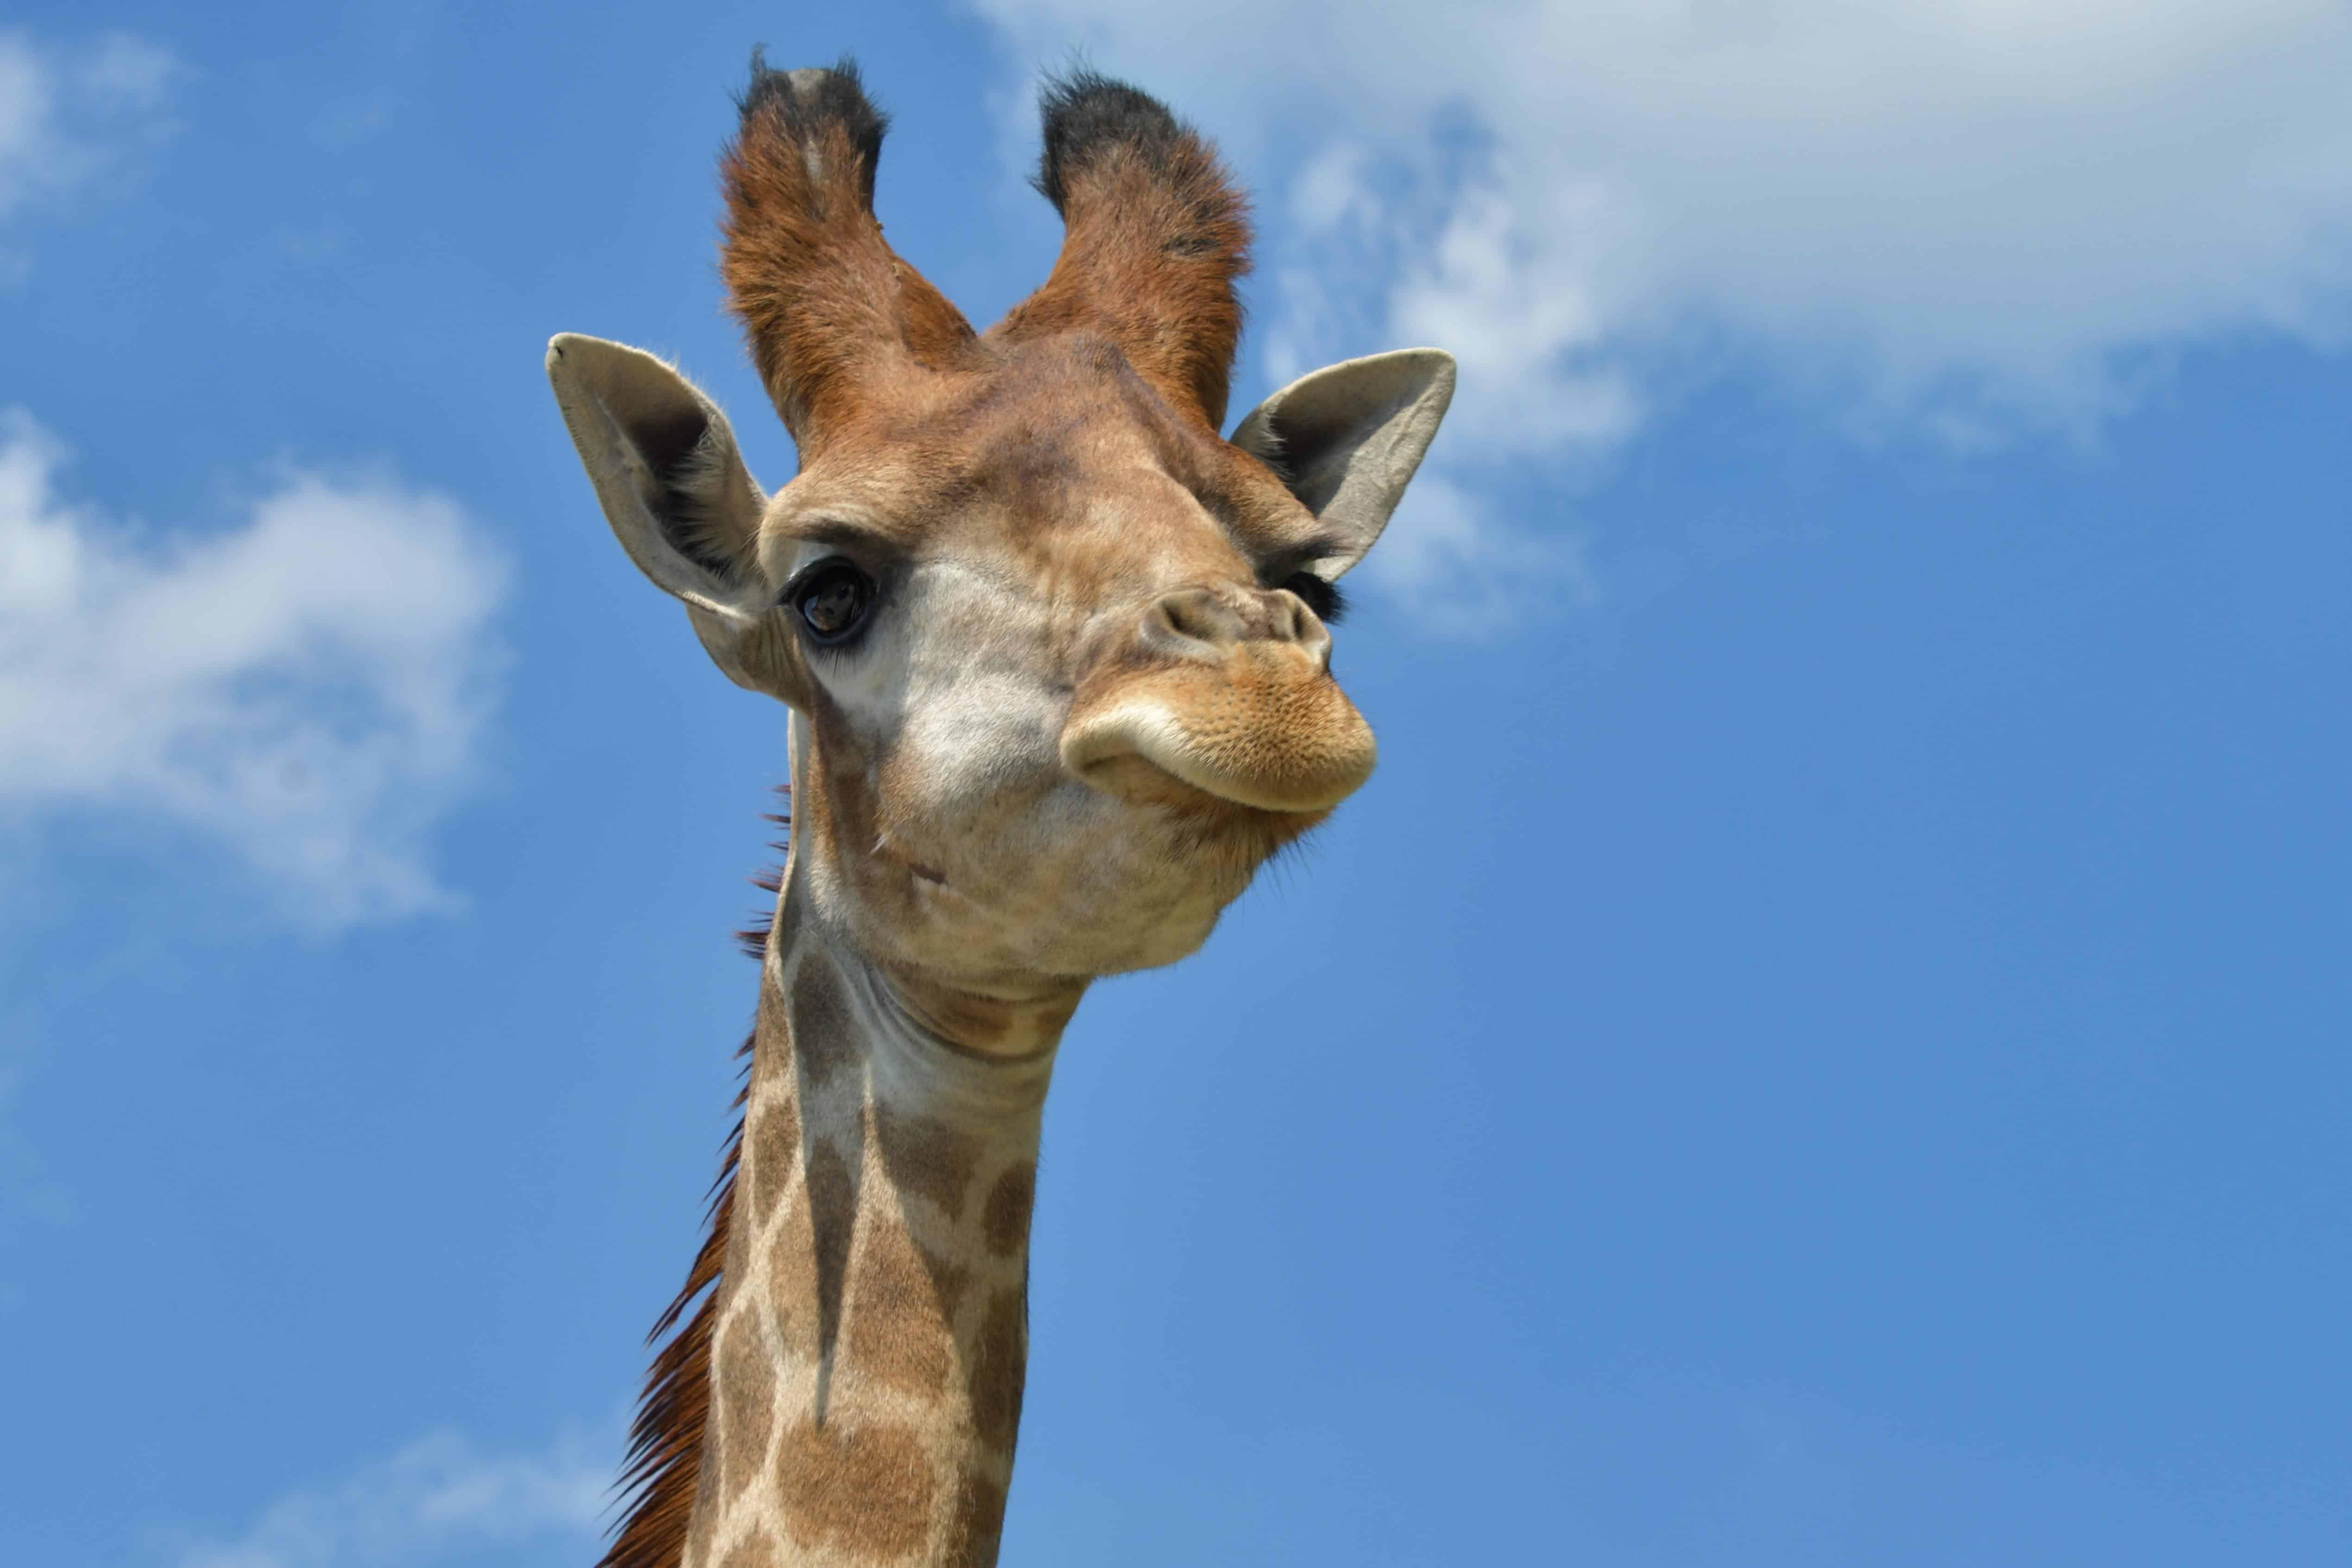 Free picture: wildlife, nature, blue sky, giraffe, animal